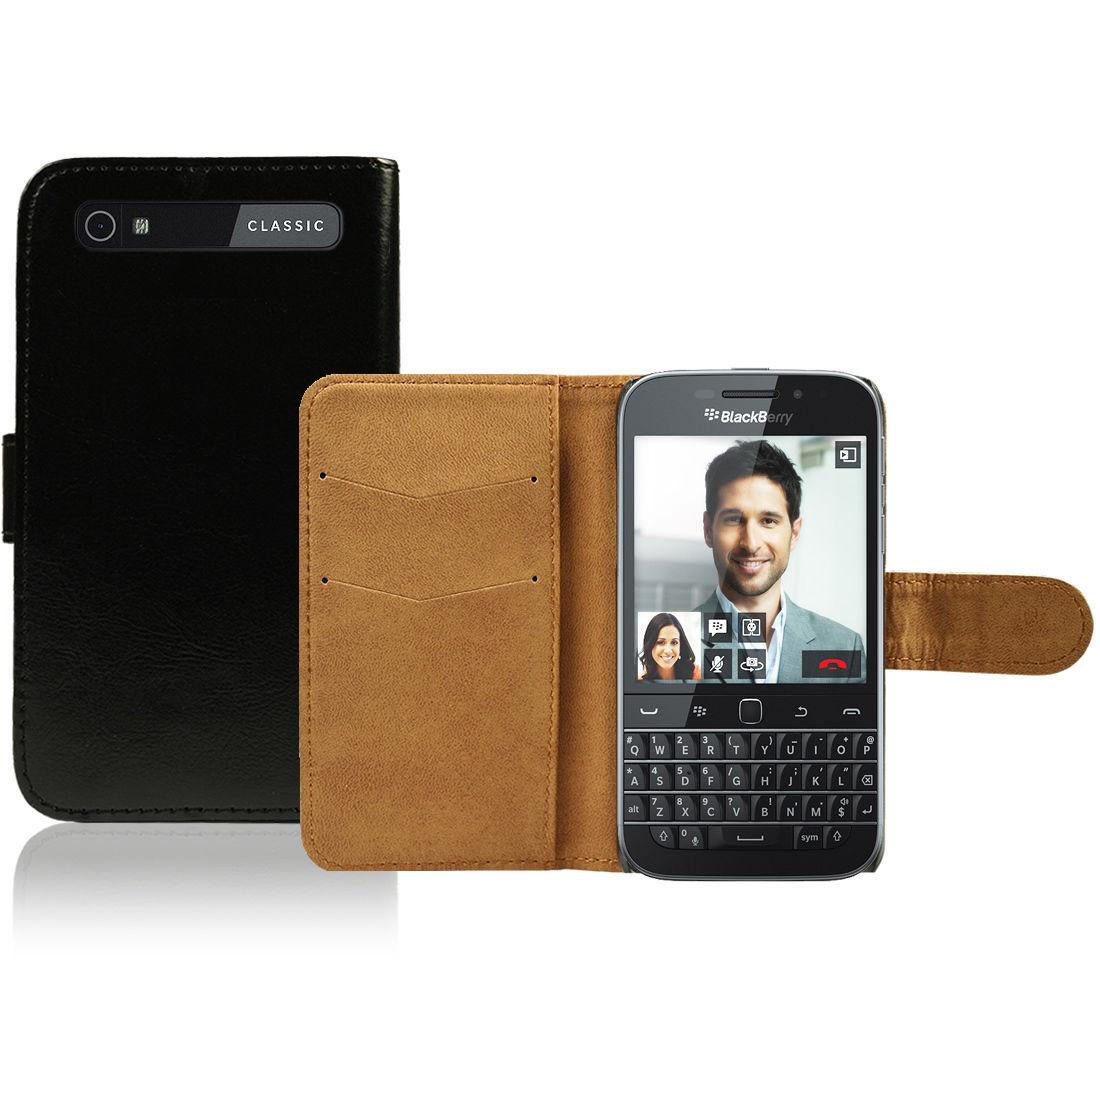 Pouzdro pro Blackberry Q20 Classic černé